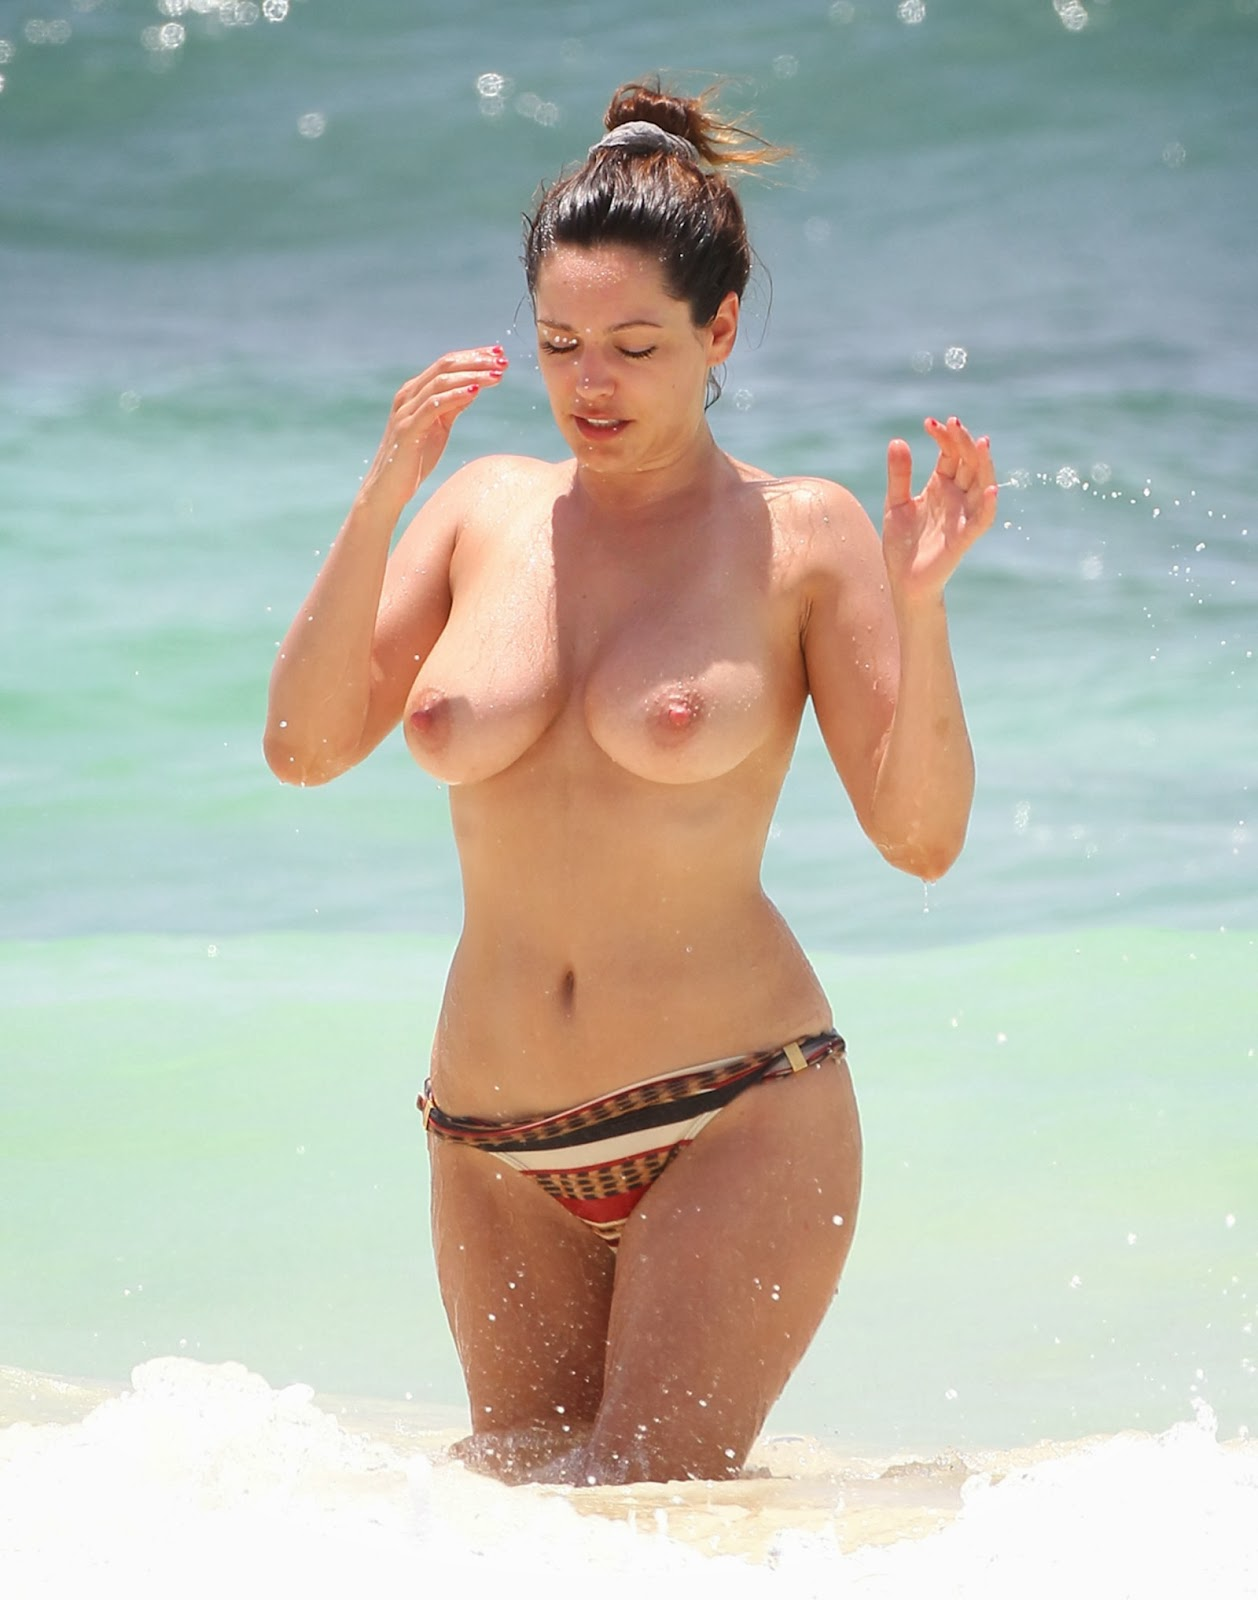 Penny pax nude pics-3603